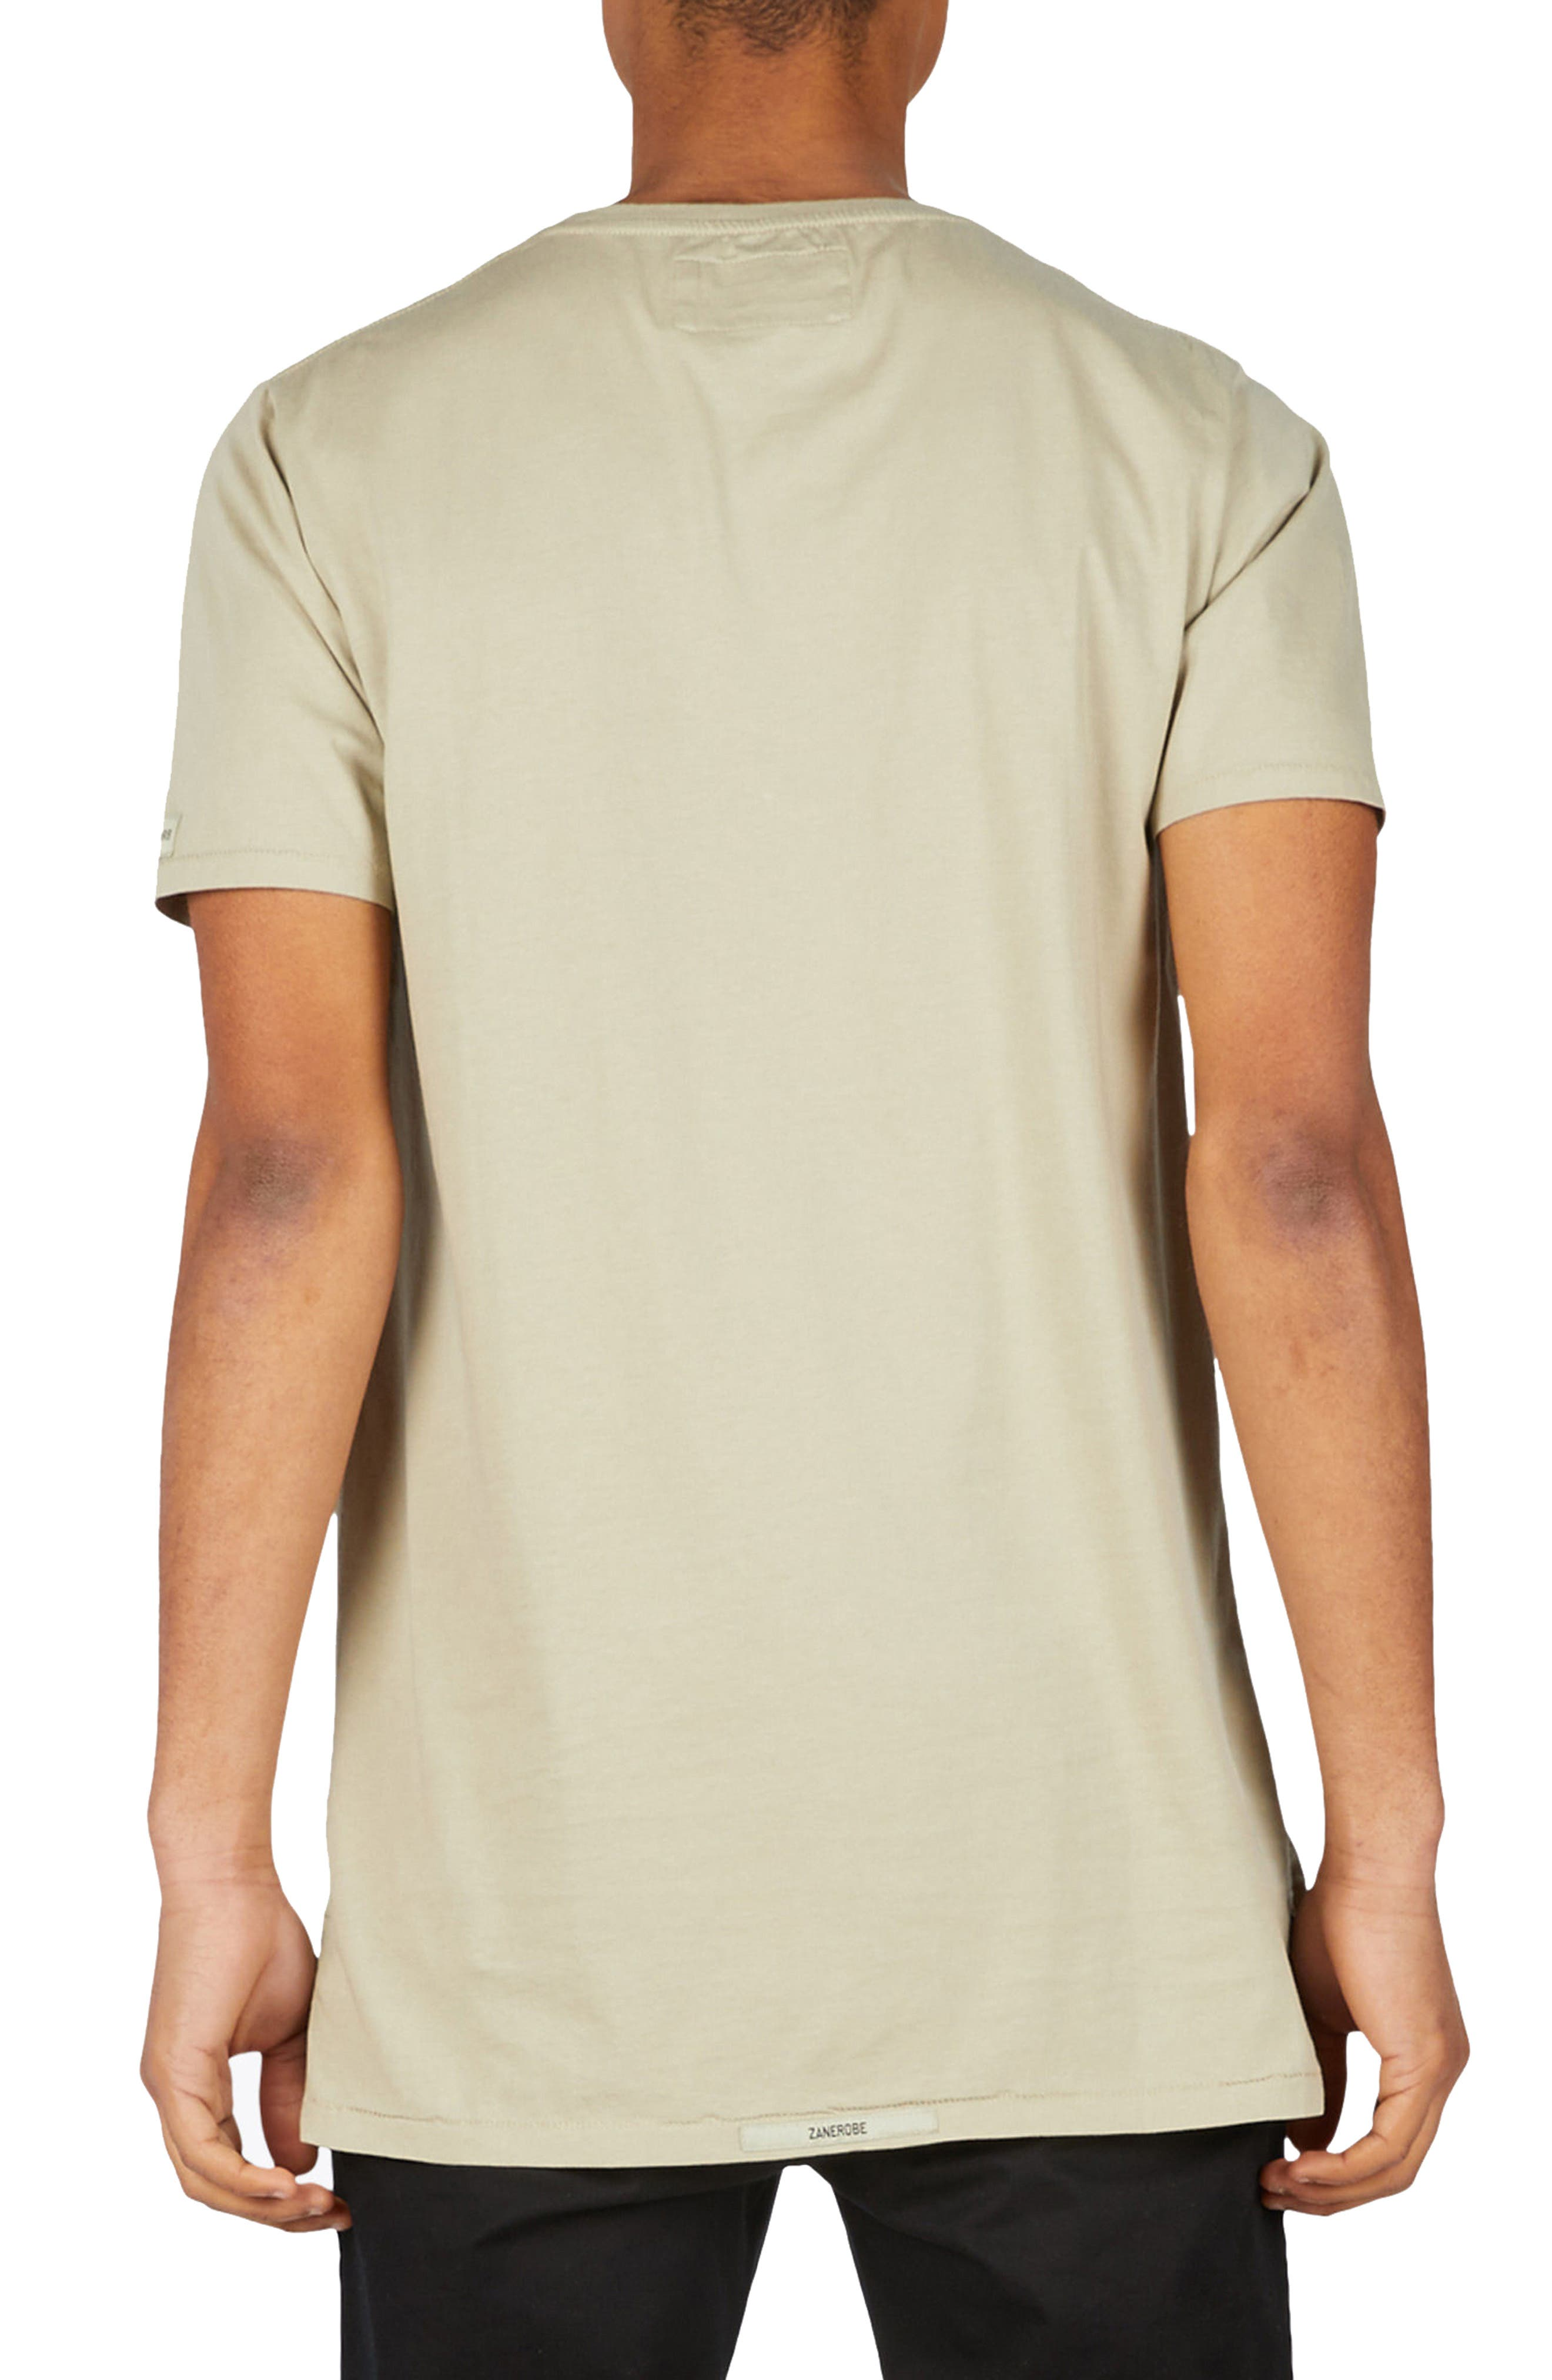 Flintlock T-Shirt,                             Alternate thumbnail 2, color,                             MOSS